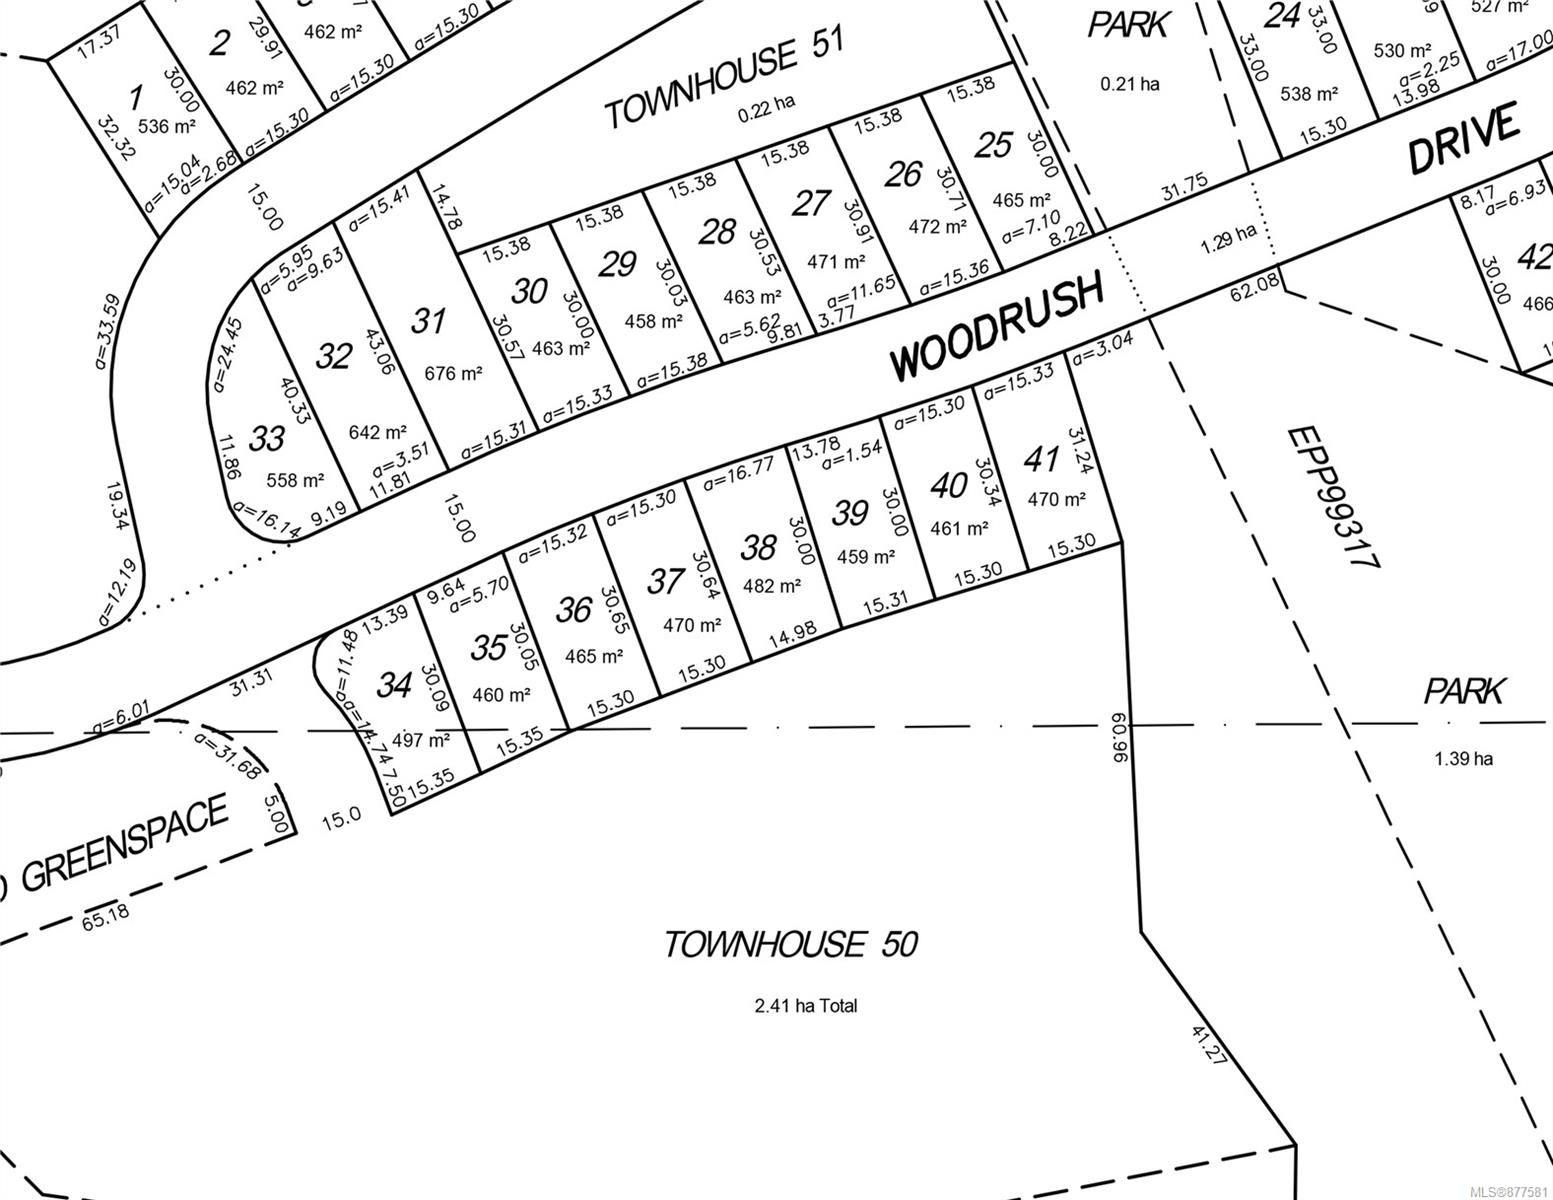 Main Photo: Lot 34 Woodrush Dr in : Du East Duncan Land for sale (Duncan)  : MLS®# 877581